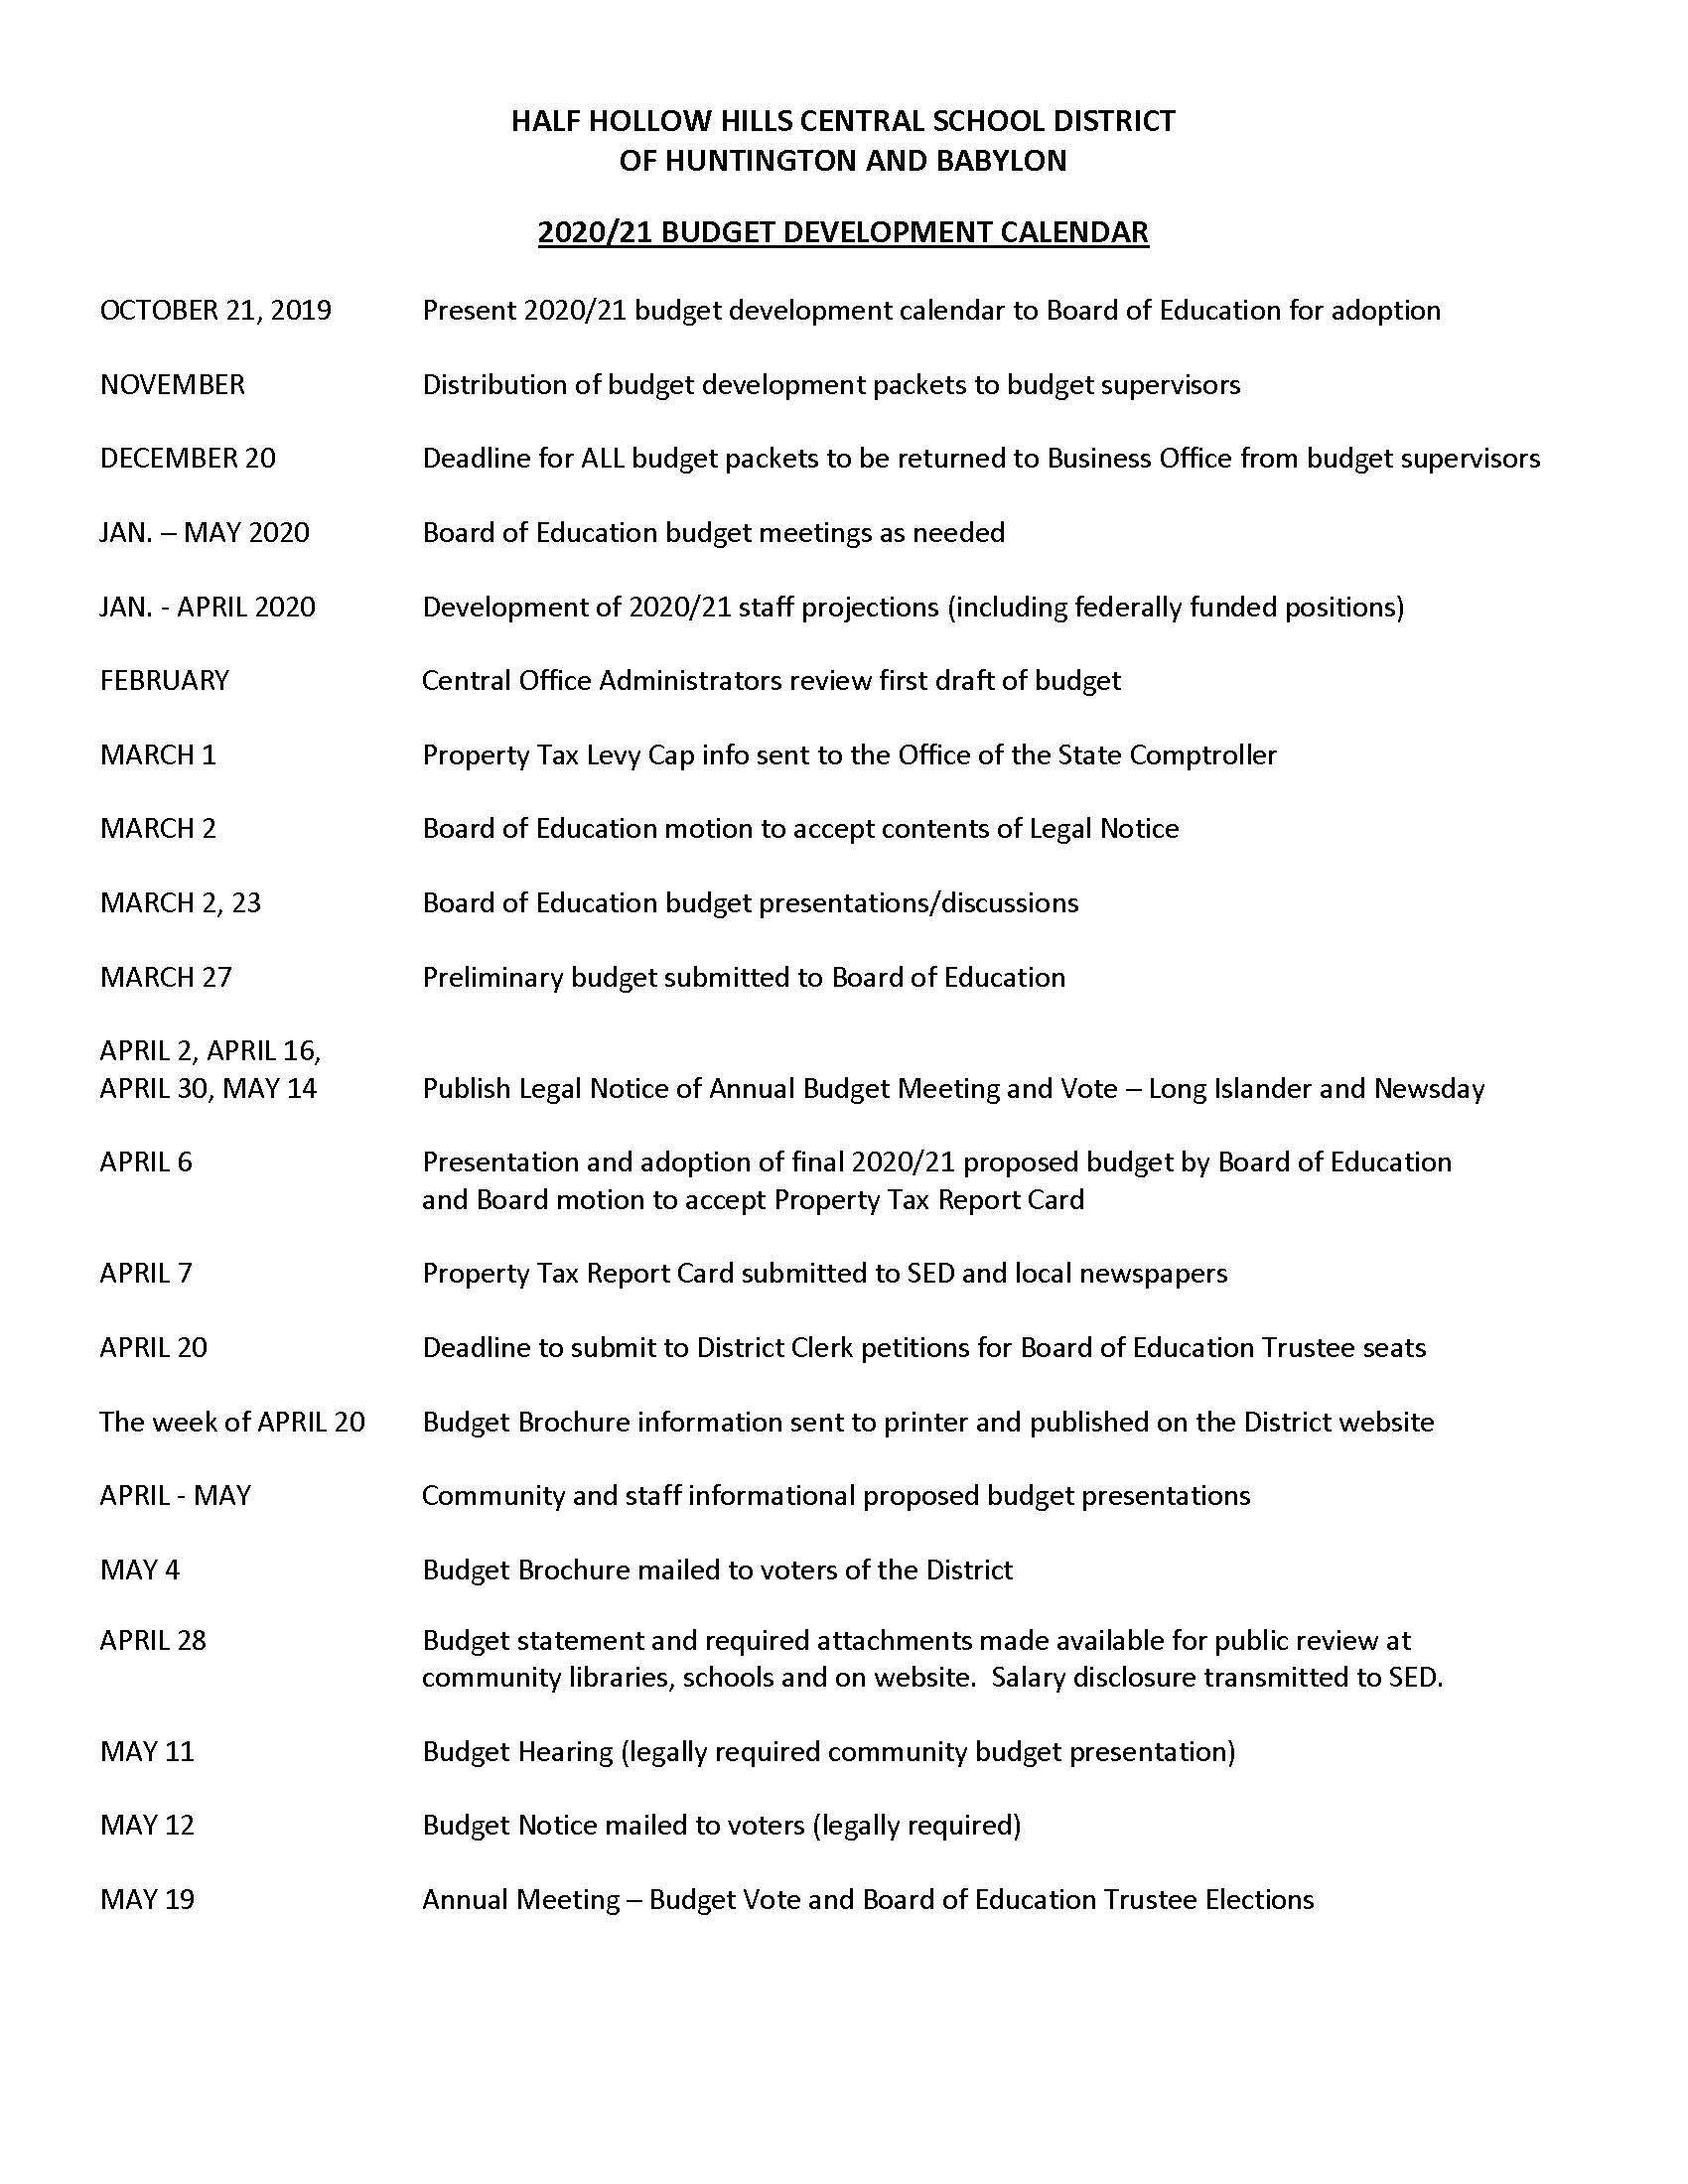 2020 21 Budget Calendar – Half Hollow Hills School District Inside Penn Hills School District 2021 2020 Calendar